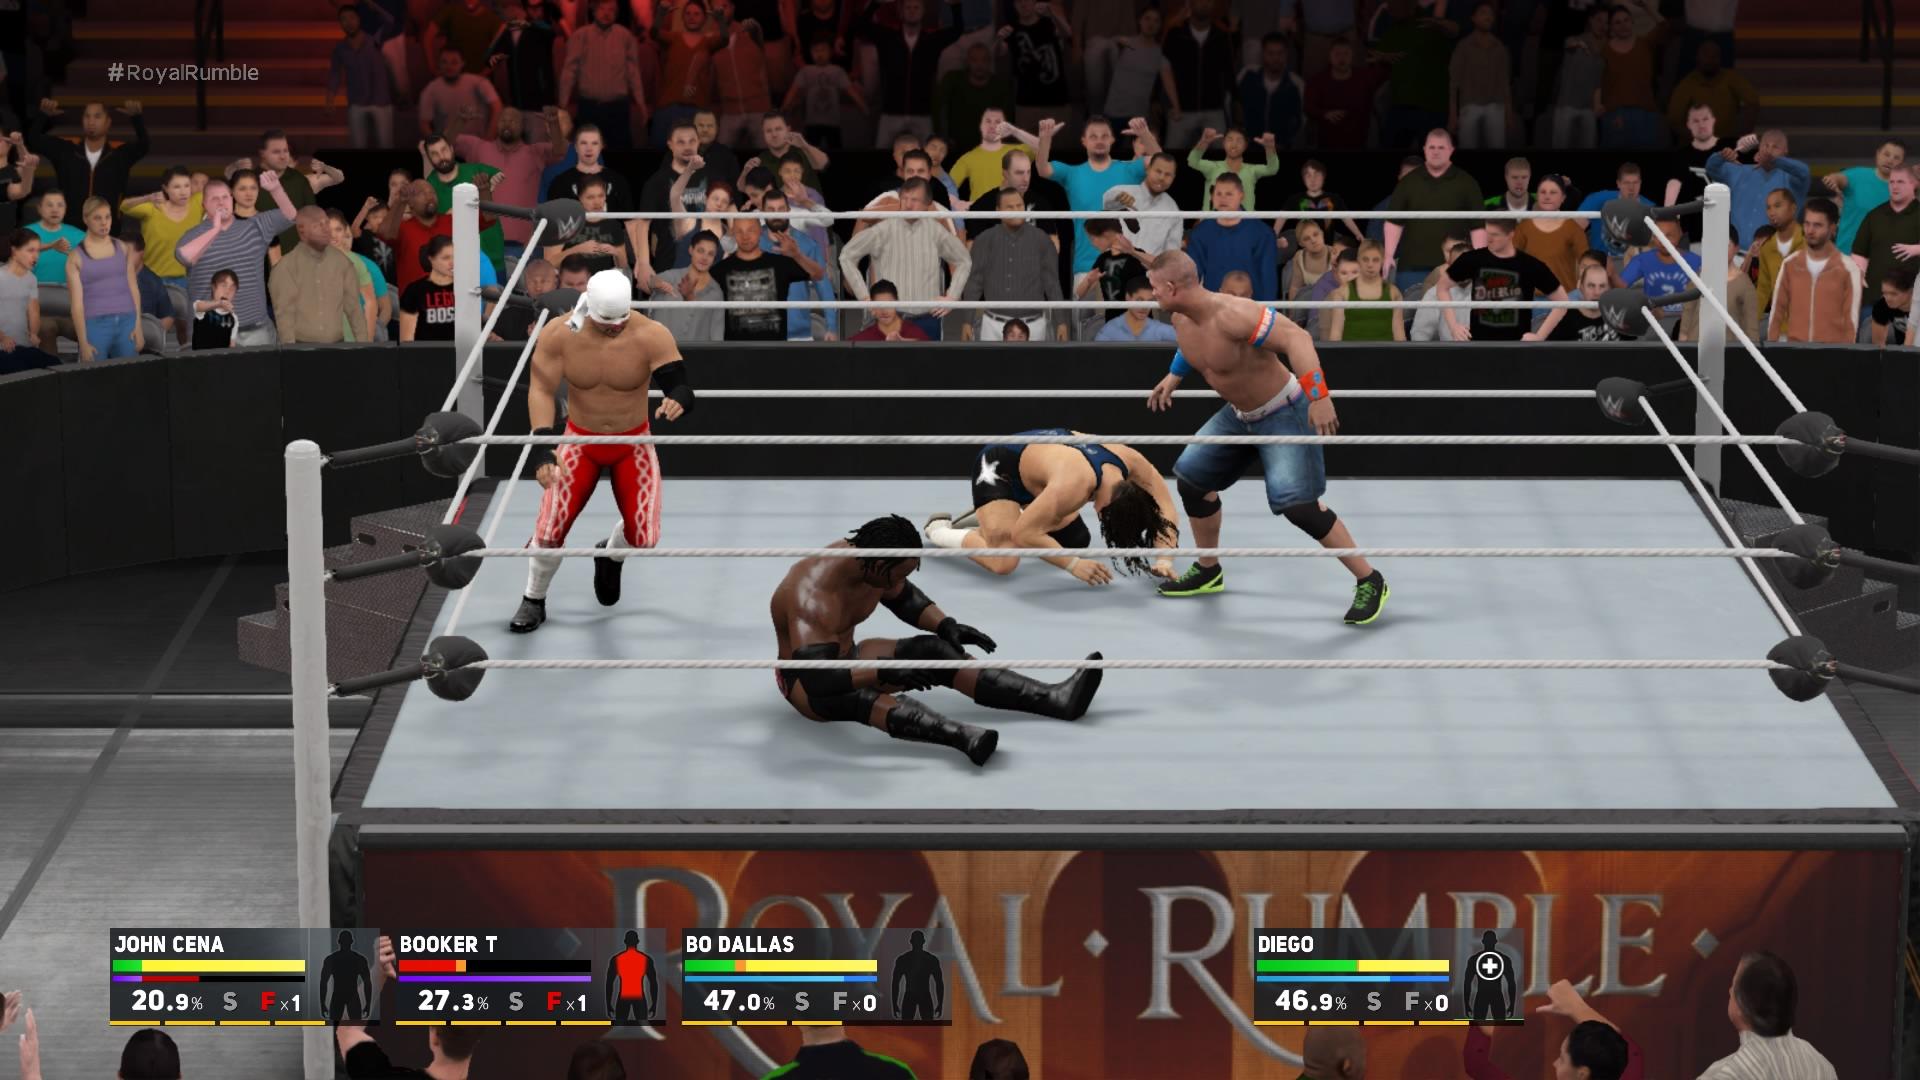 WWE%202K17